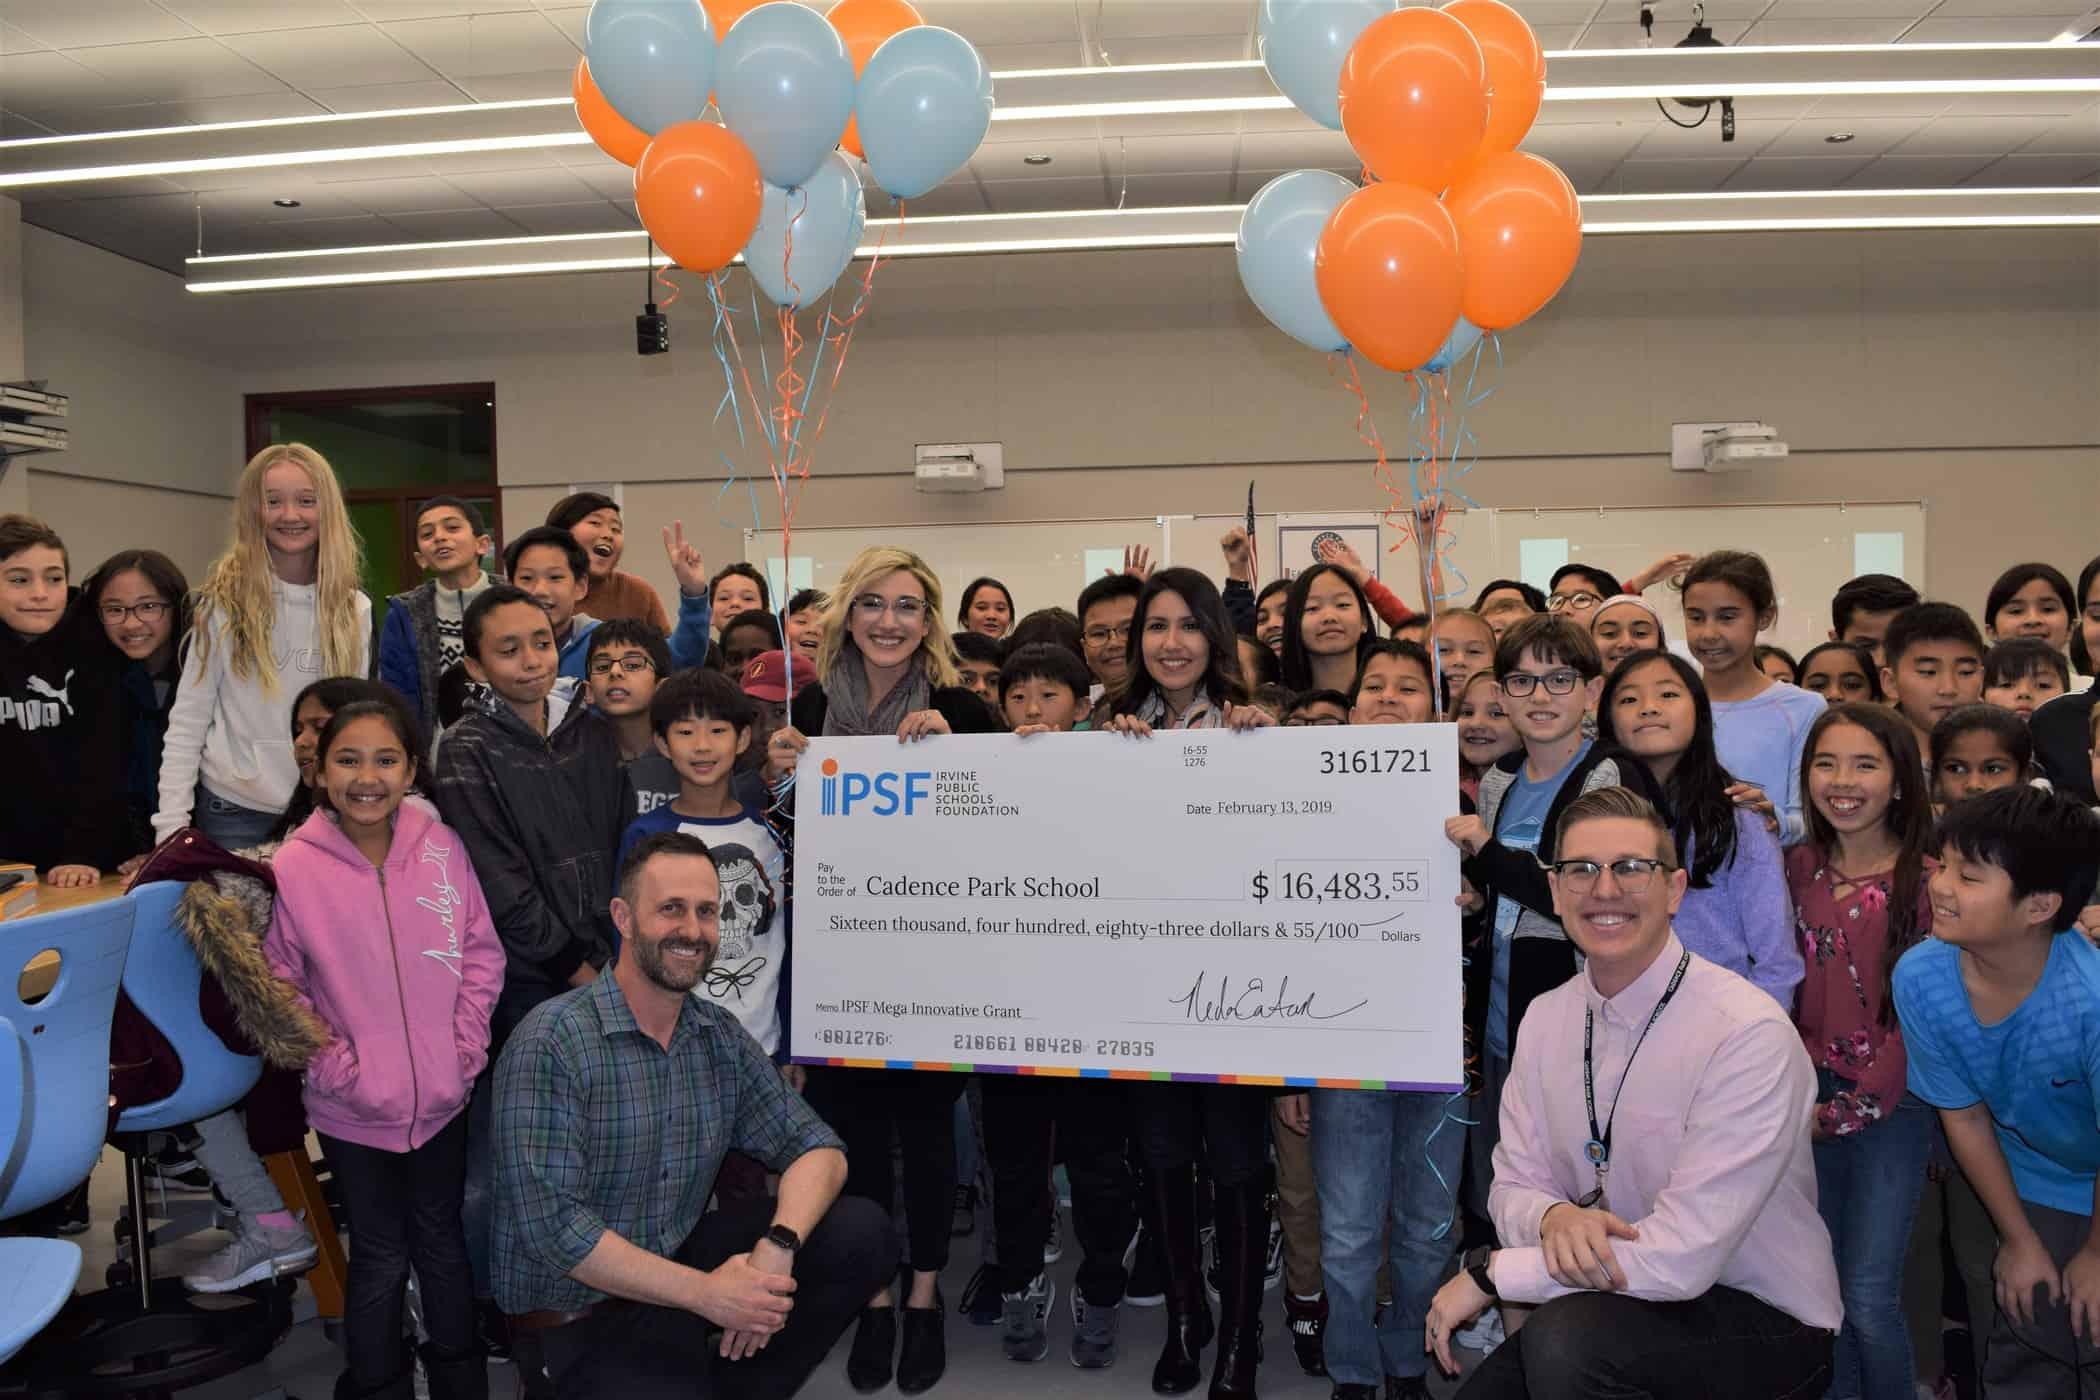 IPSF AWARDS $200,000 IN INNOVATIVE GRANTS | IPSF